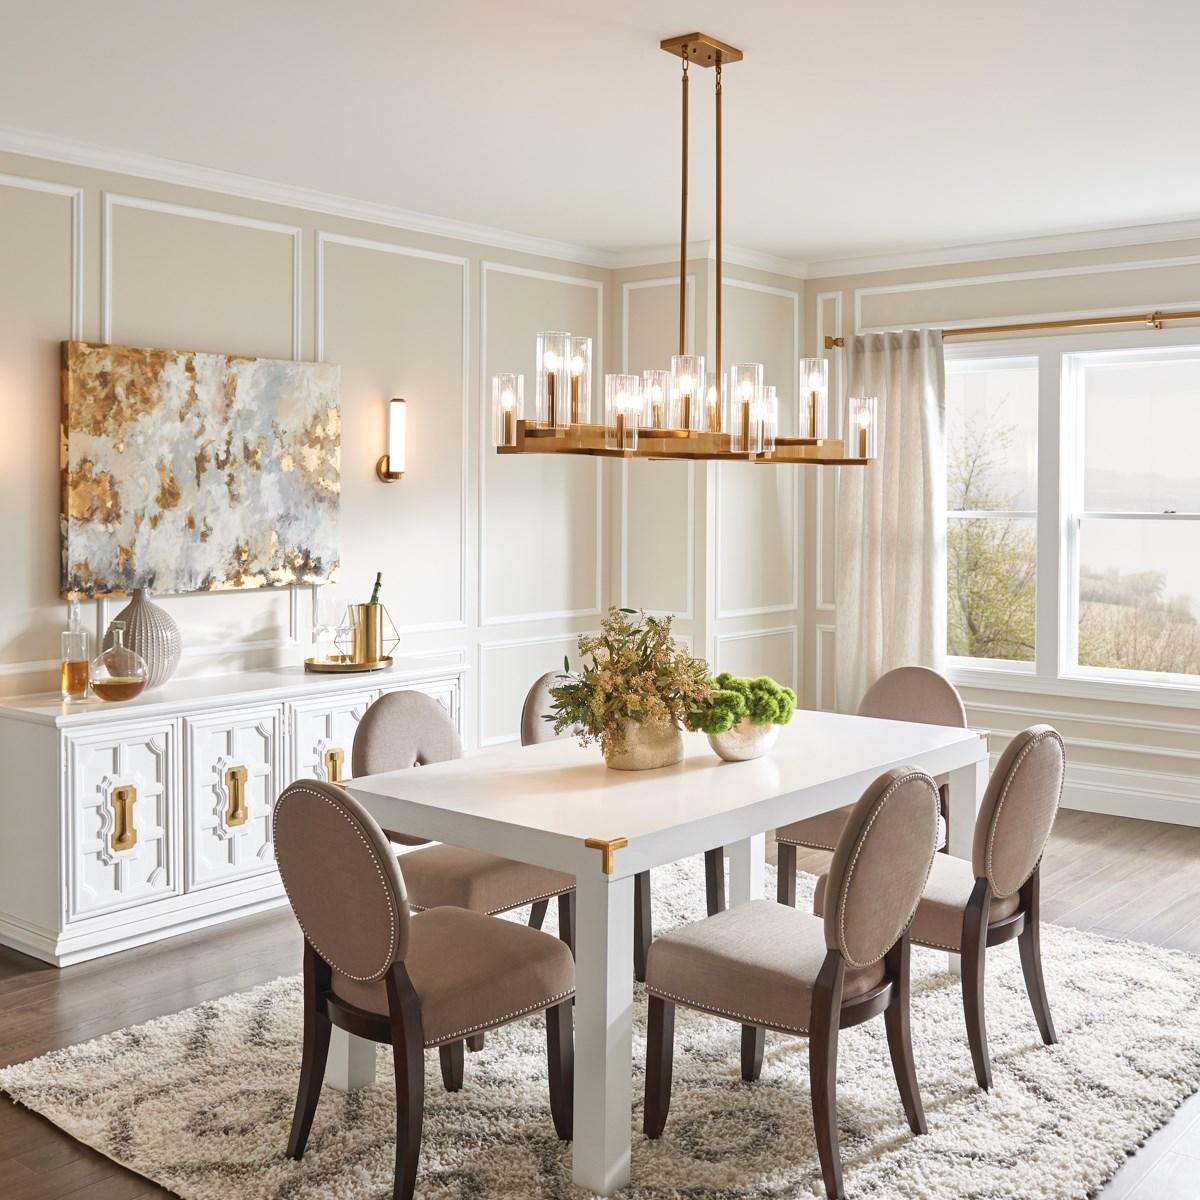 Nickel Dining Room Chandeliers: Cleara™ 14 Light Linear Chandelier Polished Nickel